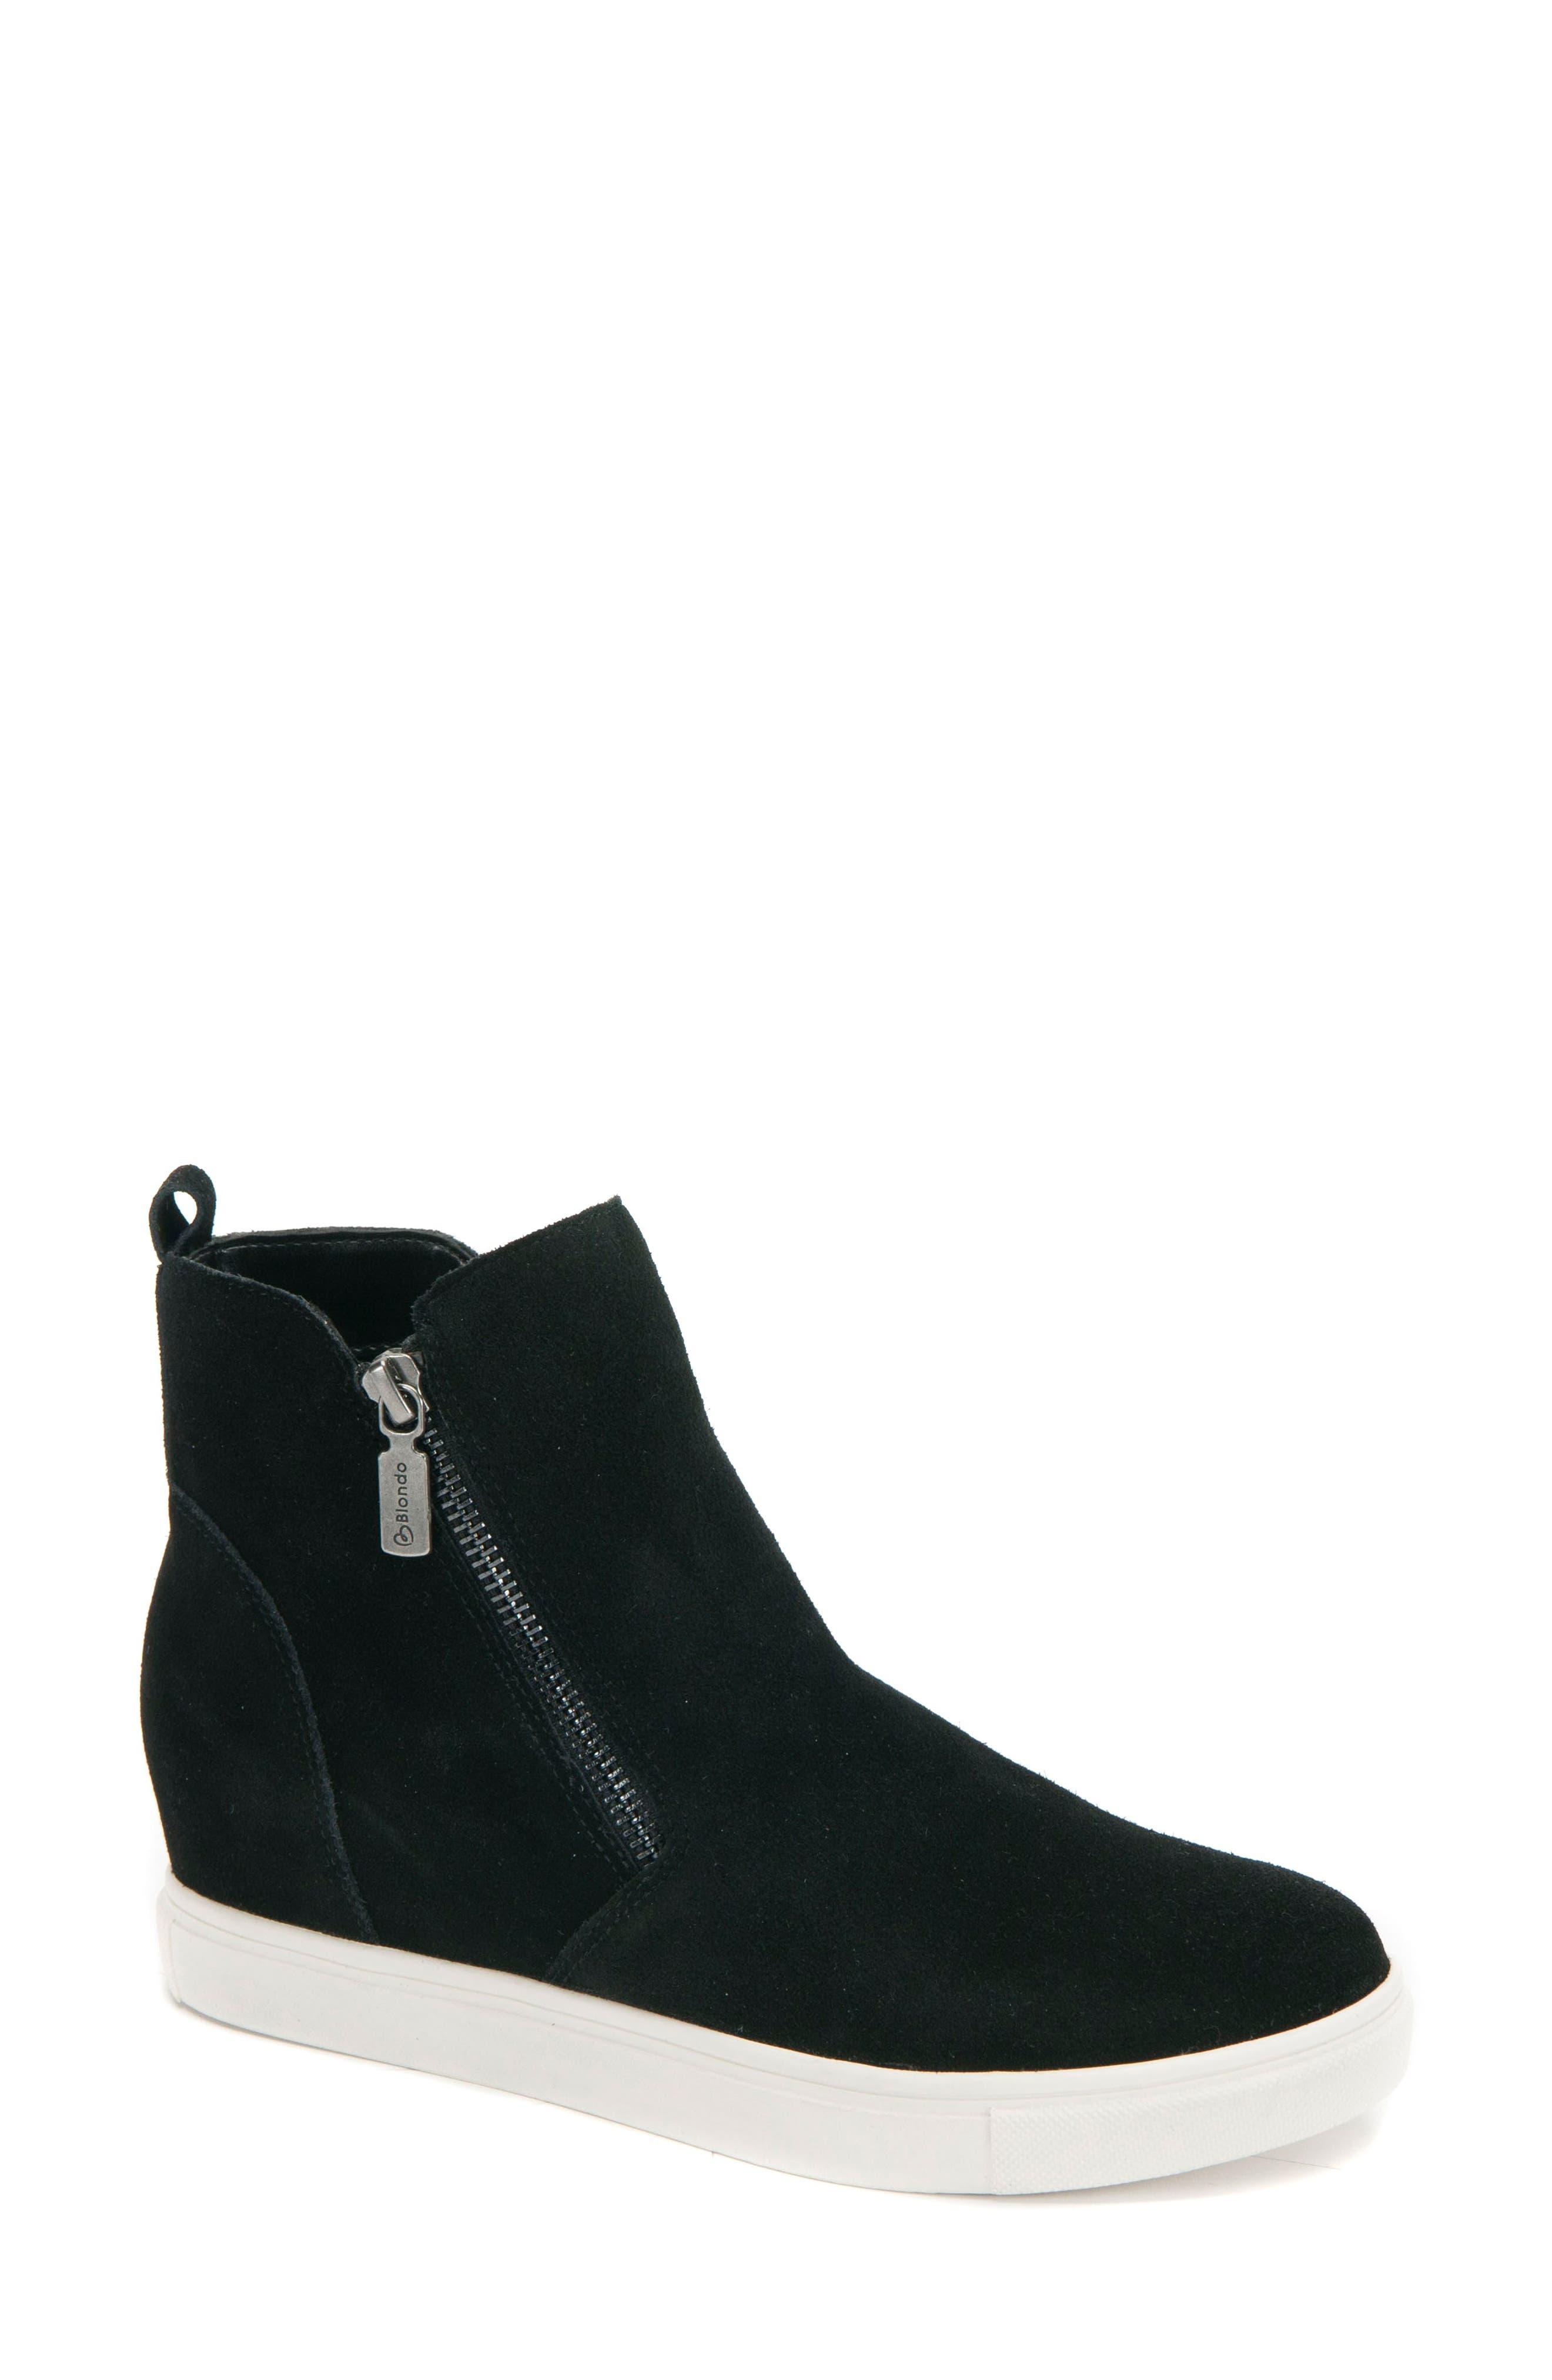 BLONDO, Giselle Waterproof Sneaker, Main thumbnail 1, color, BLACK SUEDE